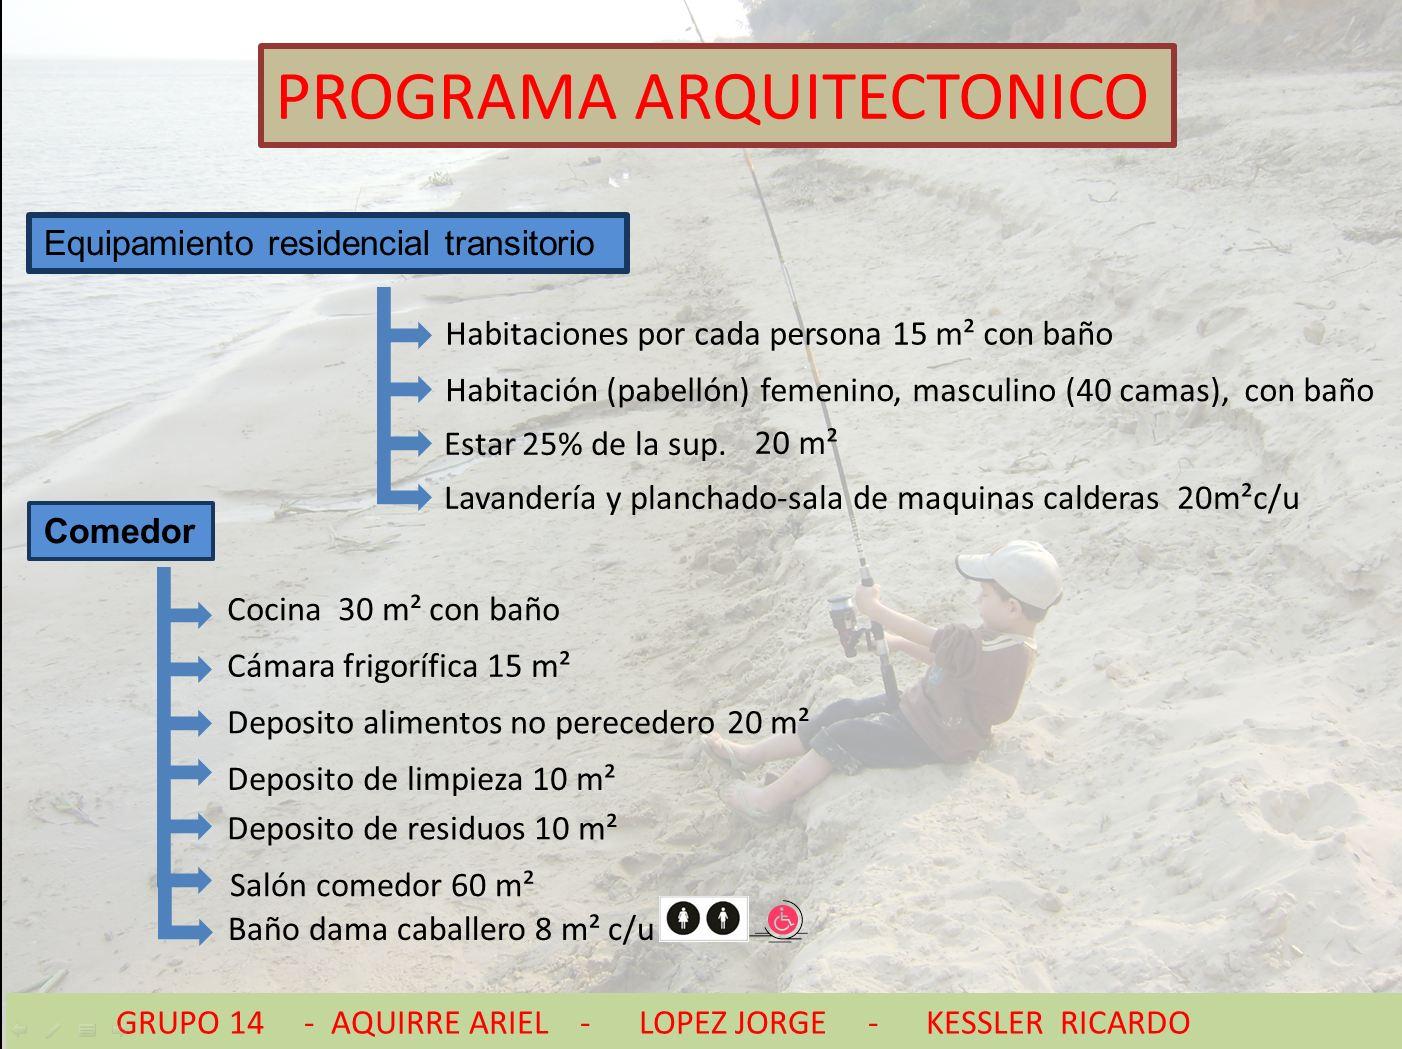 Arquitectura4 upa grupo 14 programa arquitectonico for Programa arquitectonico biblioteca